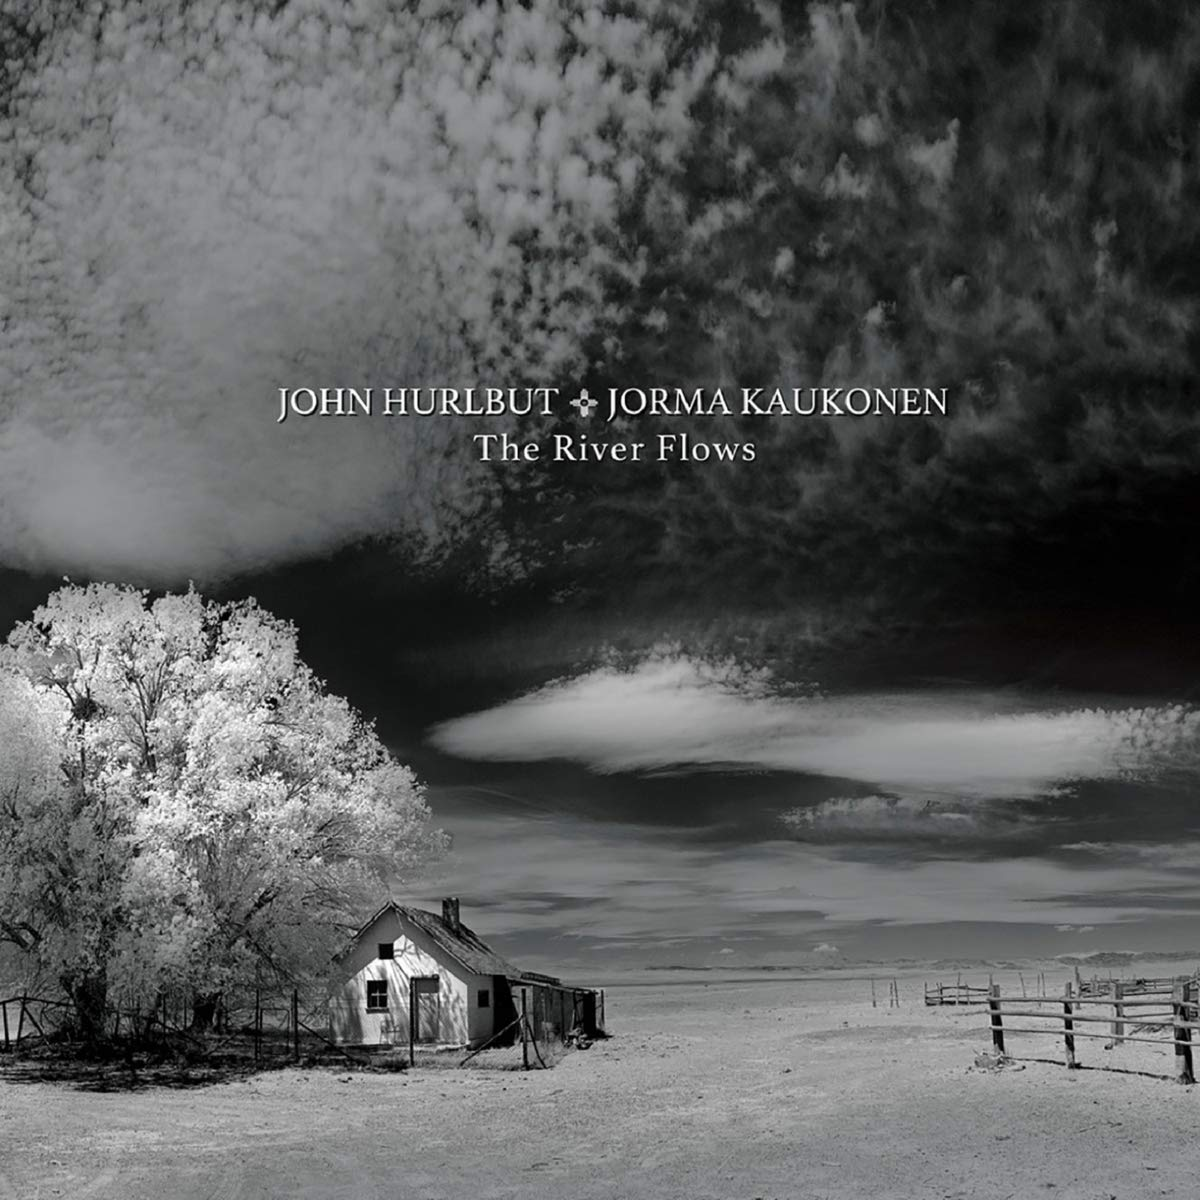 John Hurlbut & Jorma Kaukonen - River Flows [LTD LP]